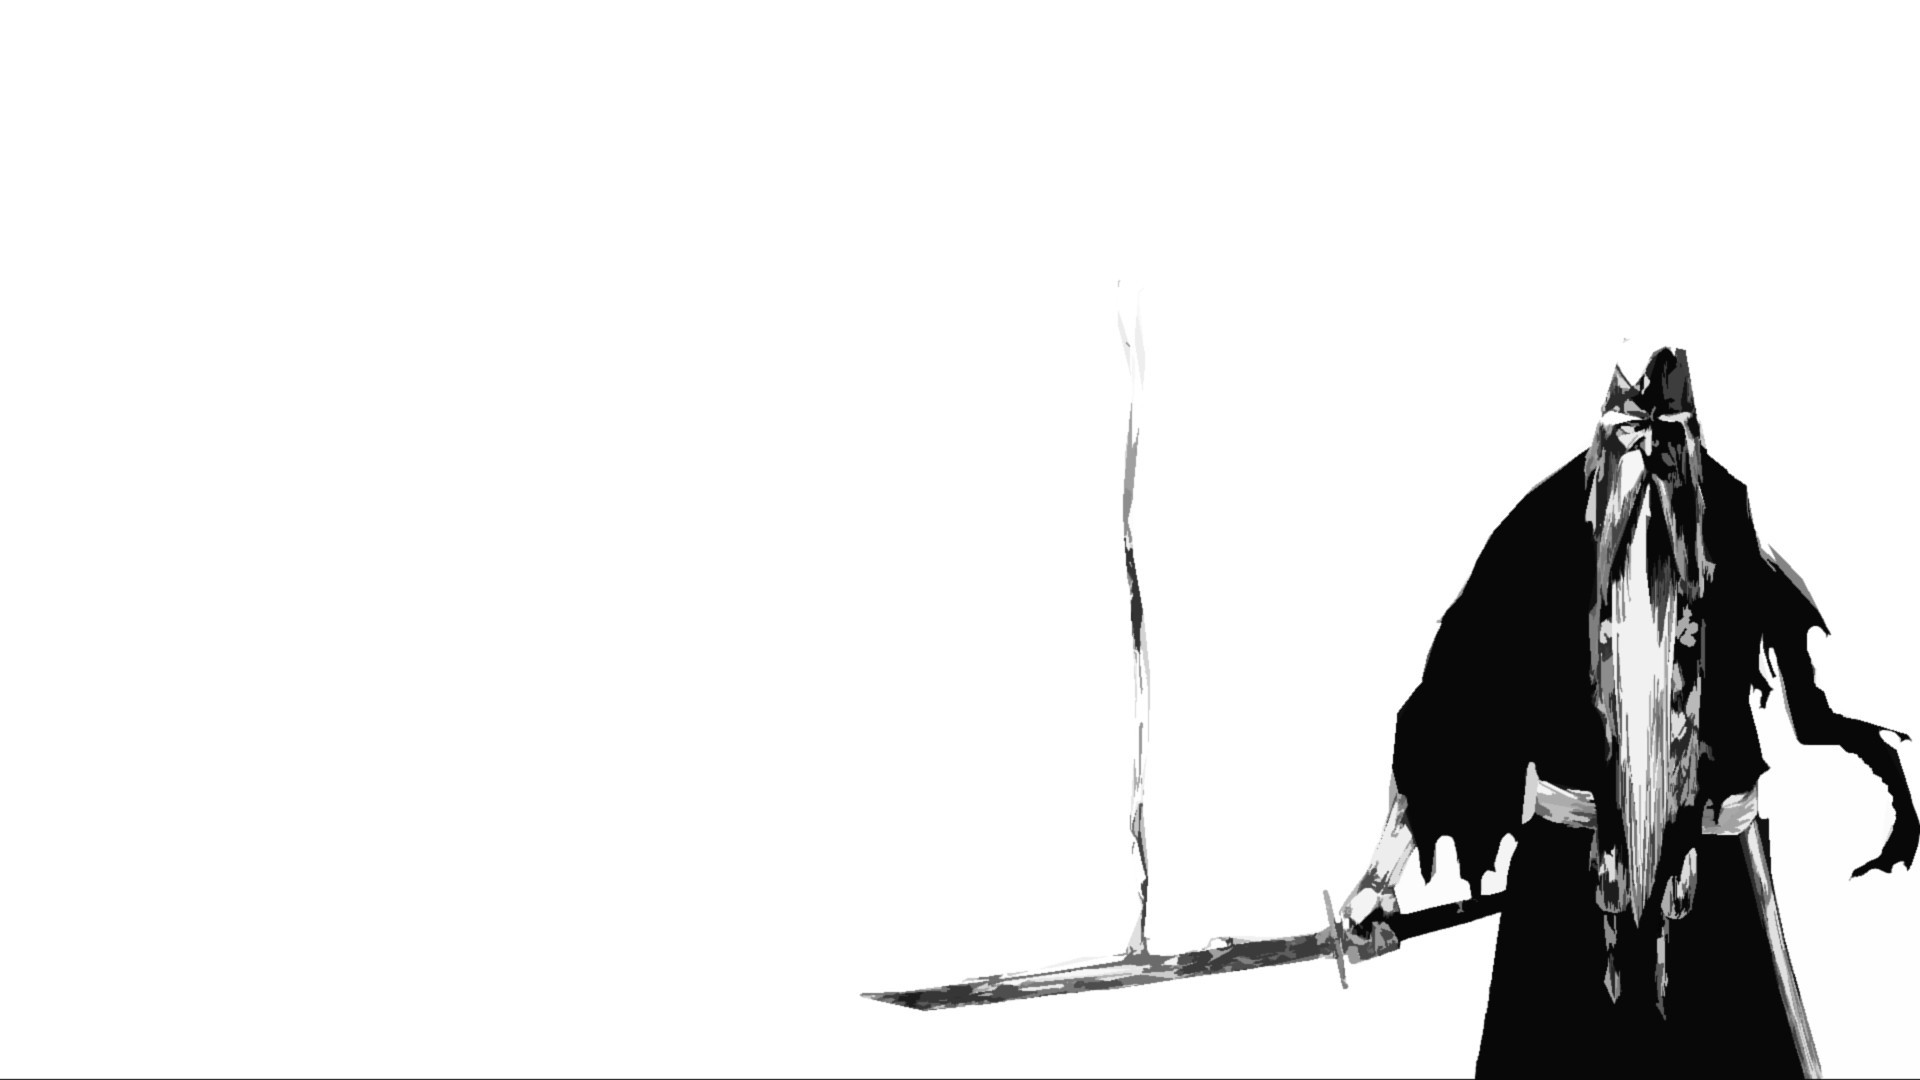 Bleach grayscale sword...